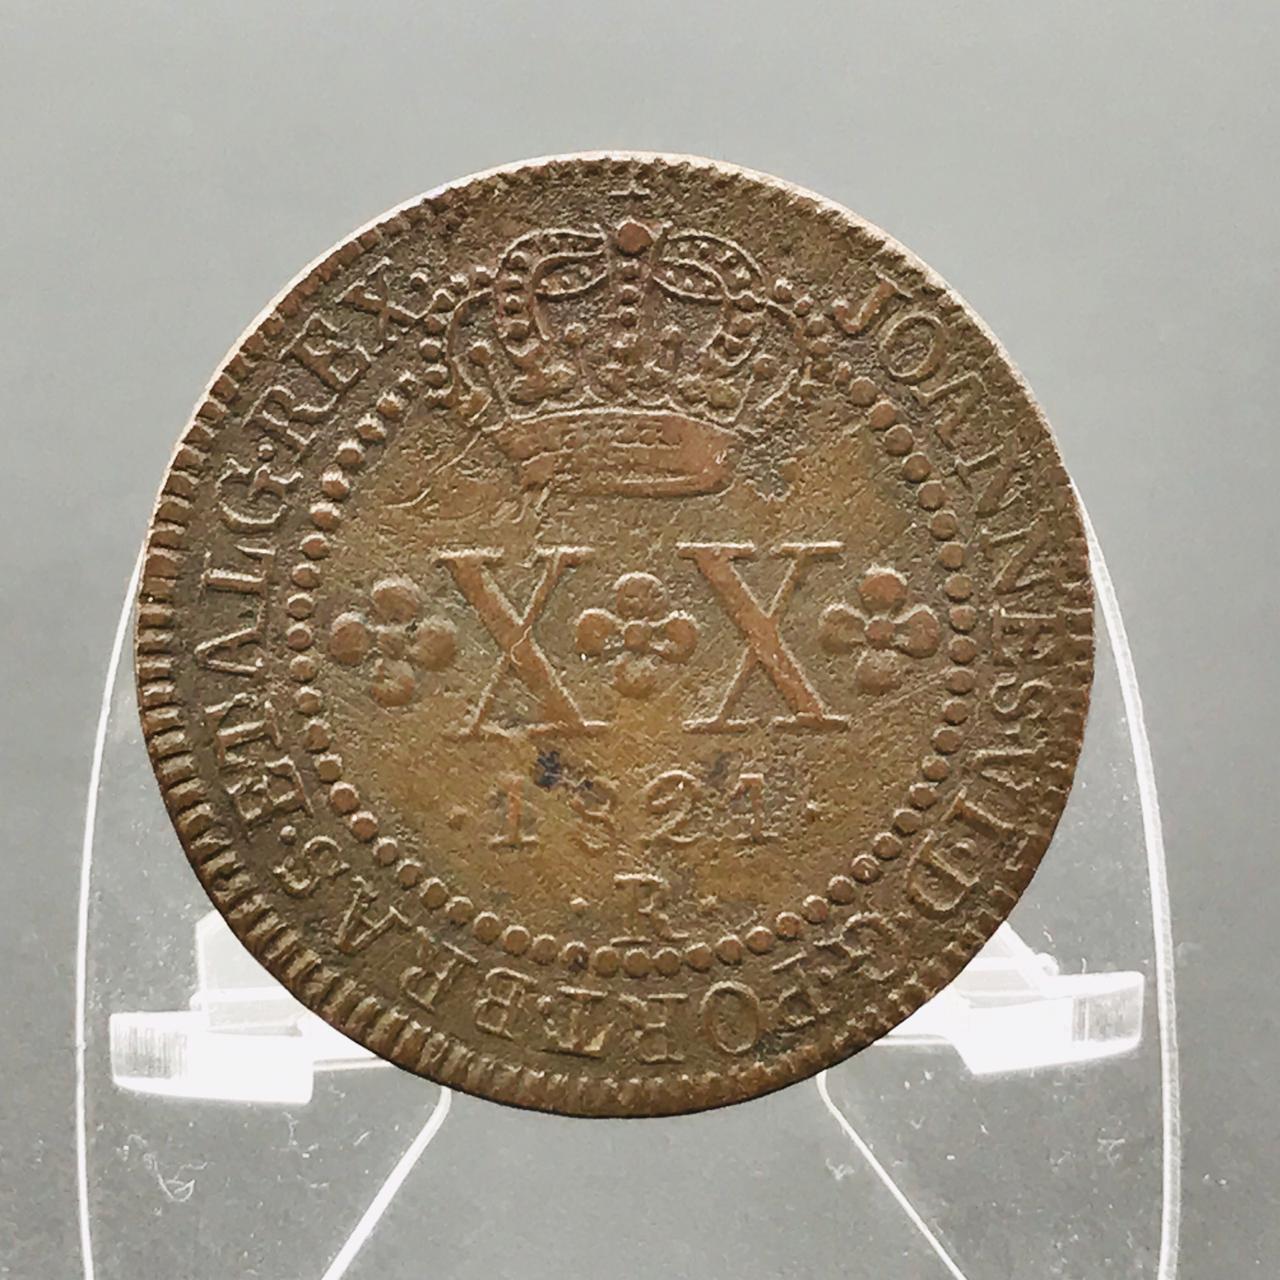 XX RÉIS 1821 R. Cobre